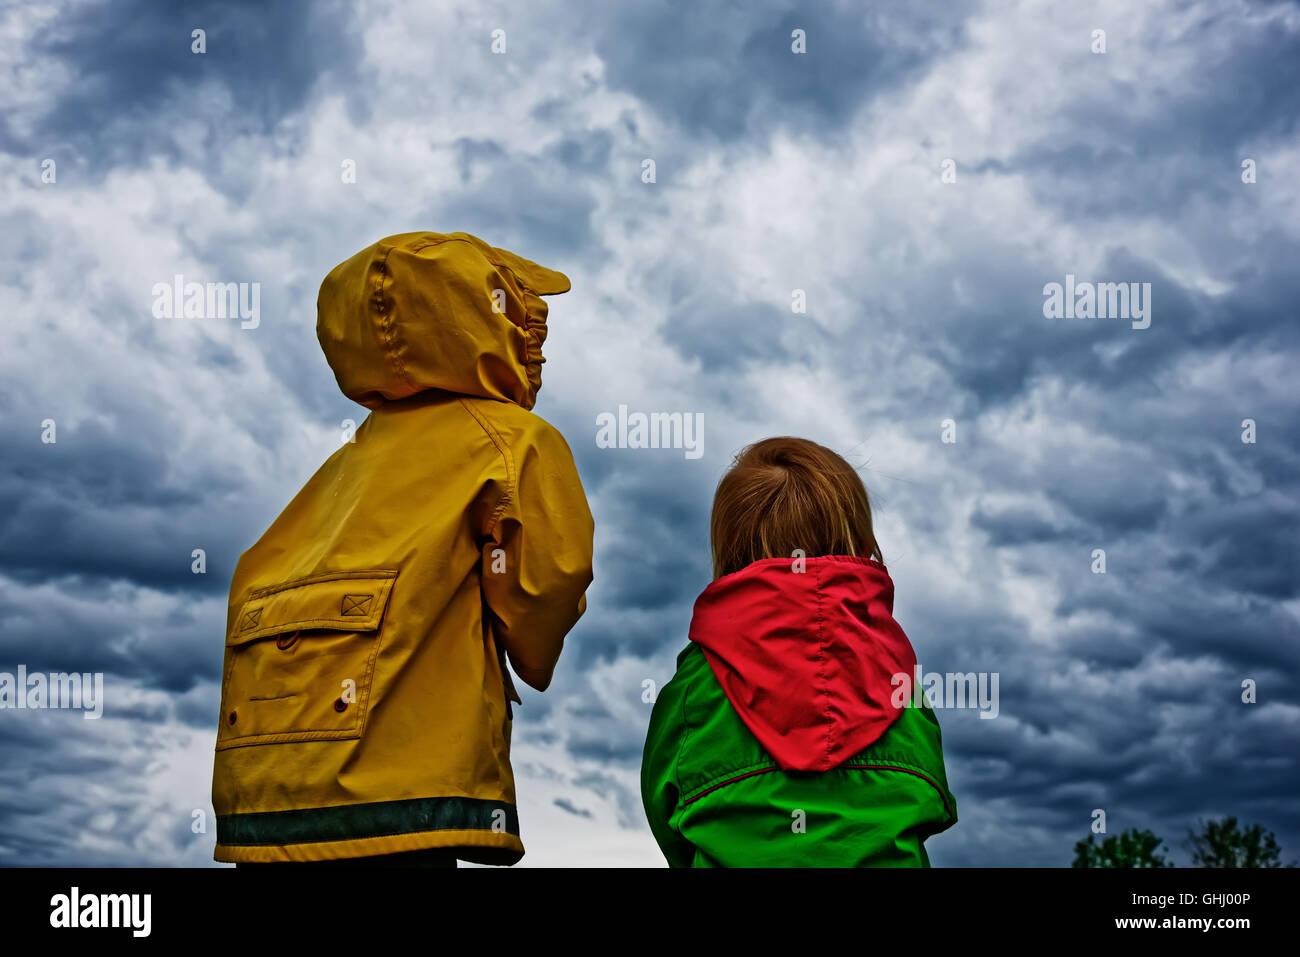 Dos niños se unieron buscando ansiosamente a acercarse a una tormenta Imagen De Stock